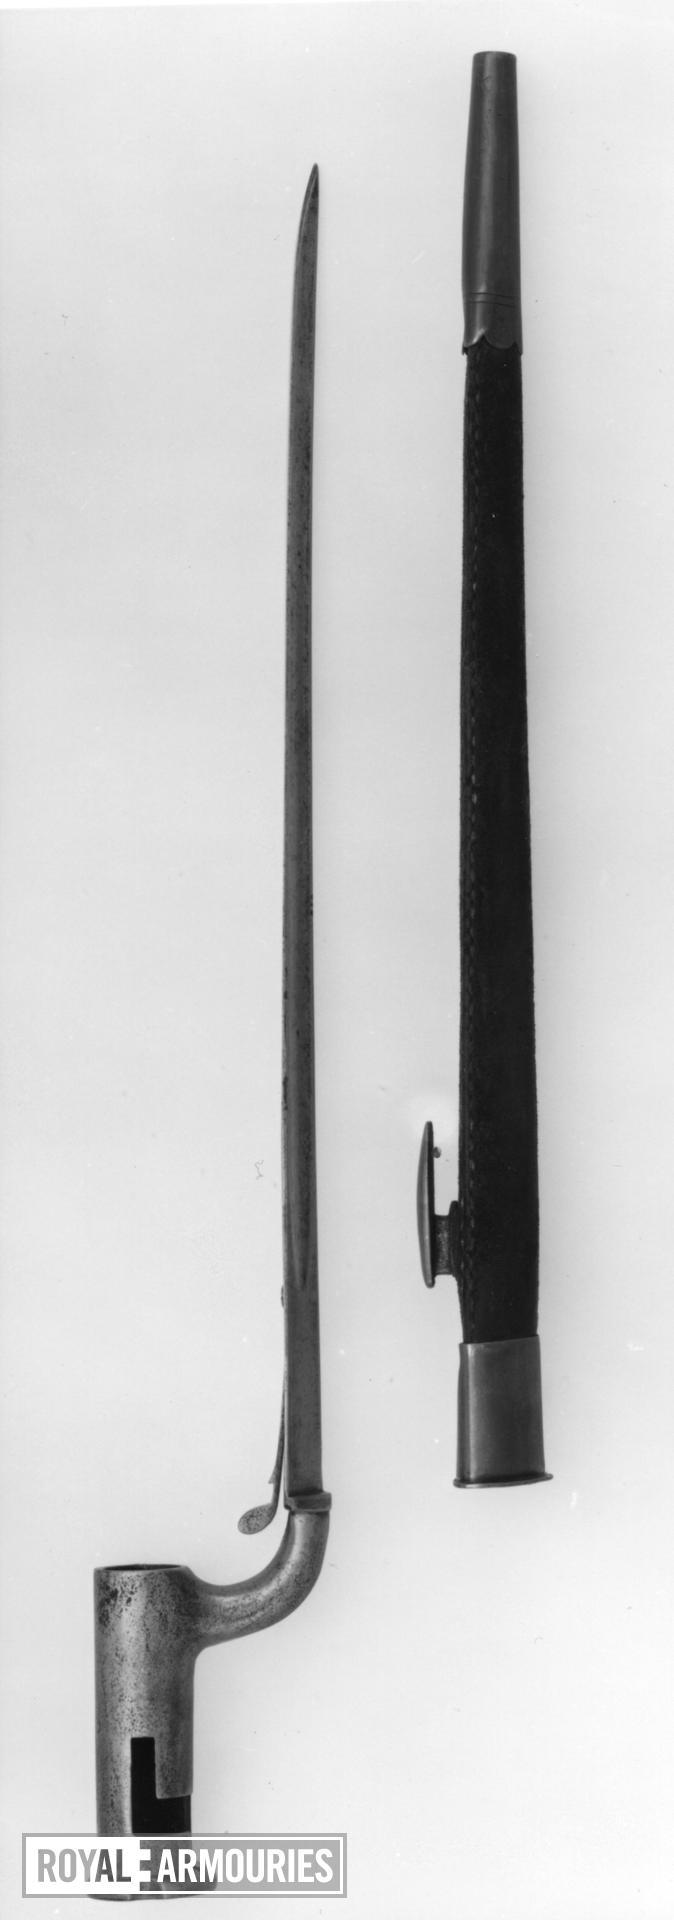 Bayonet and scabbard